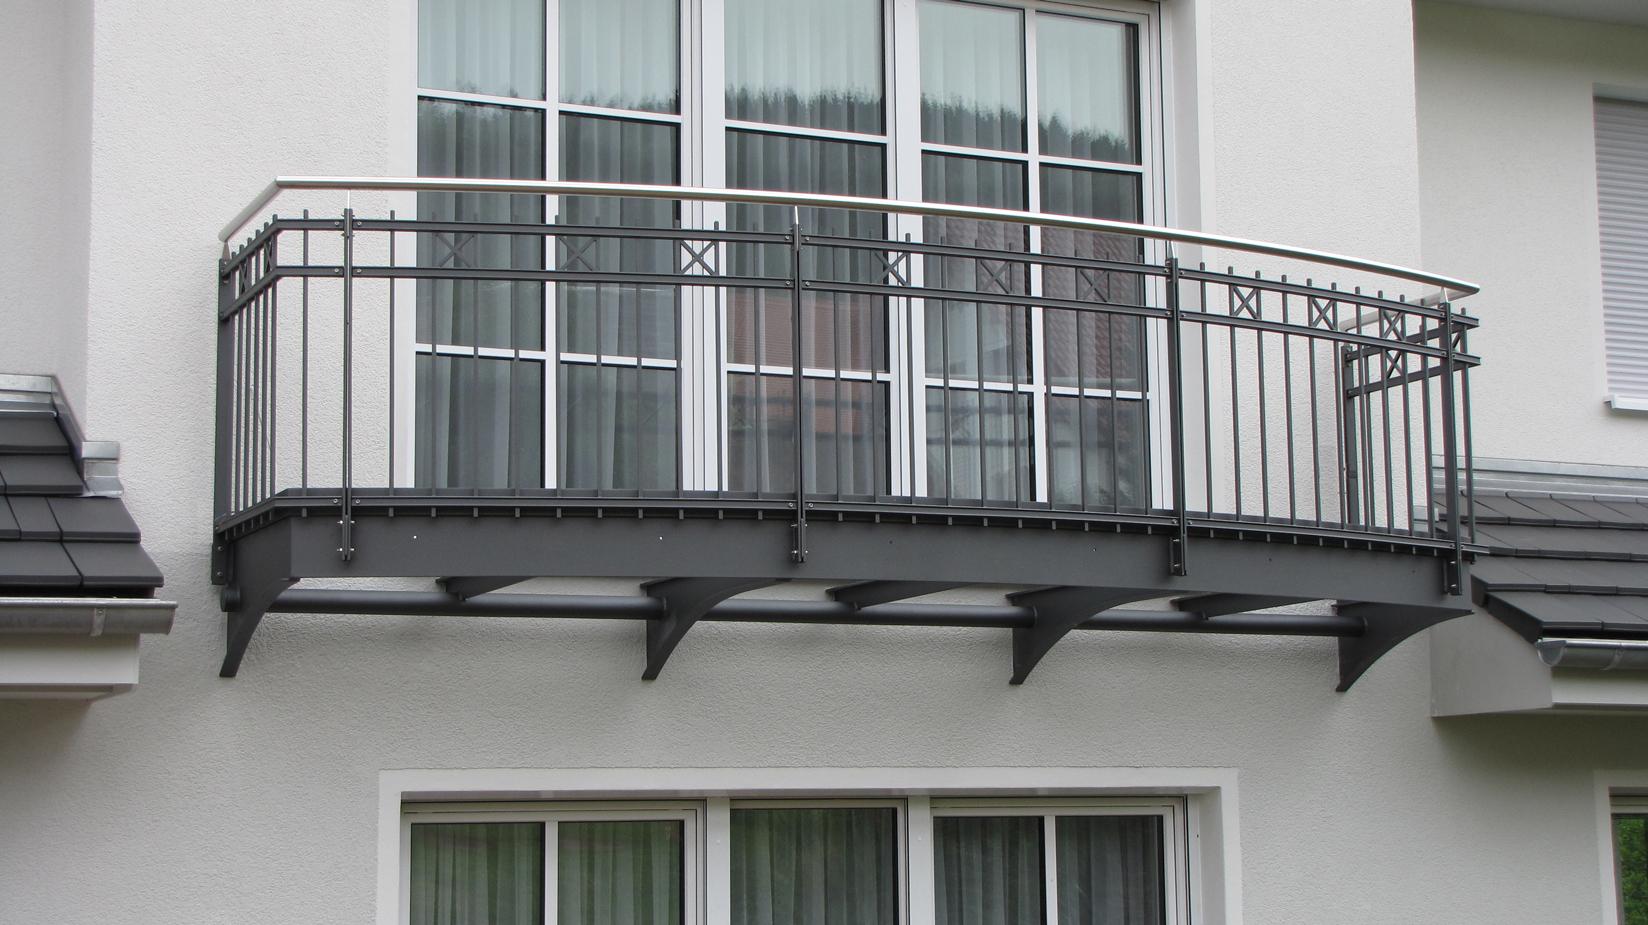 balkongel nder metallbau metallgestaltung treppenbau. Black Bedroom Furniture Sets. Home Design Ideas